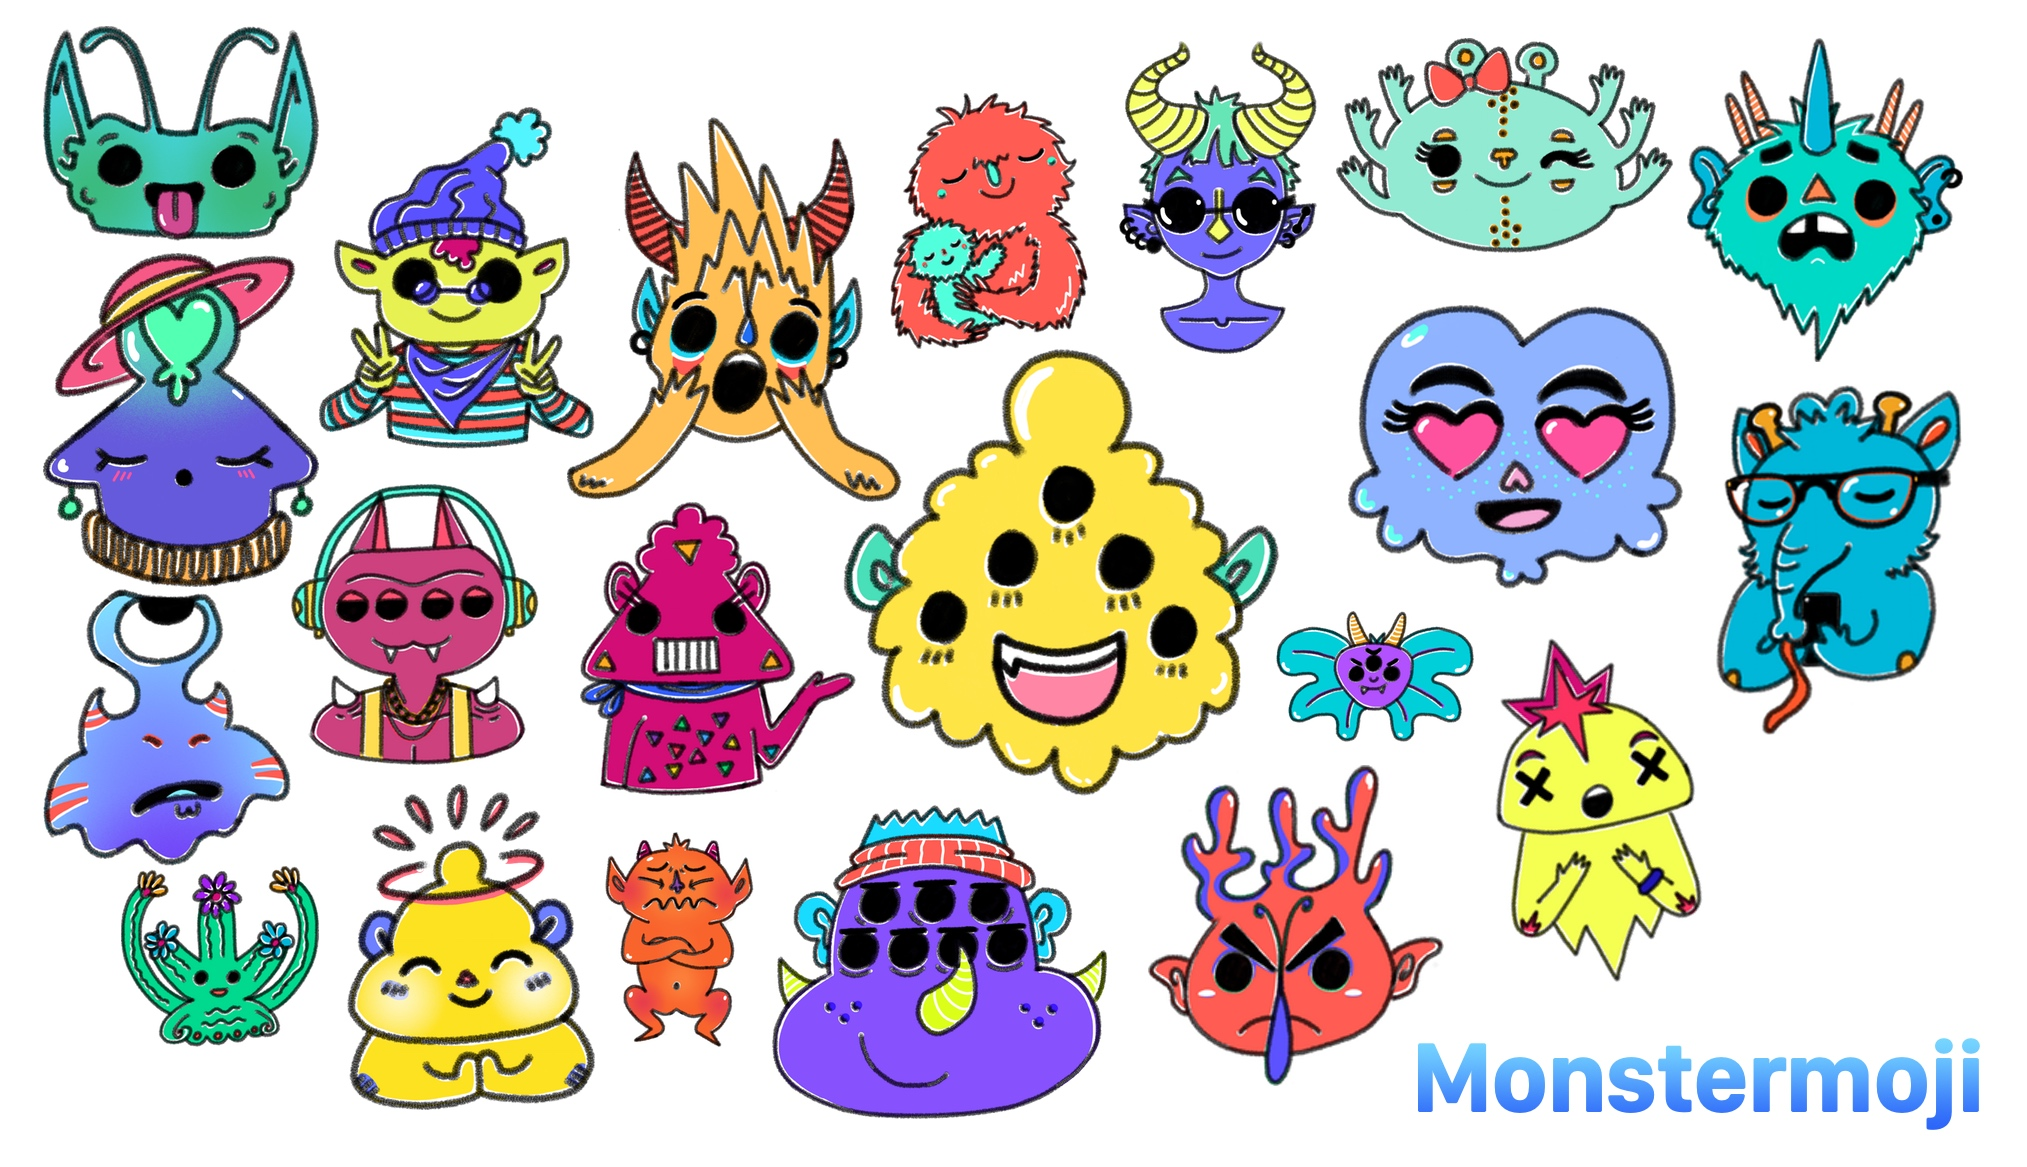 Download Monstermoji For IMessage Now 26 Beautiful Stickers Emotive Monsters Original Artwork